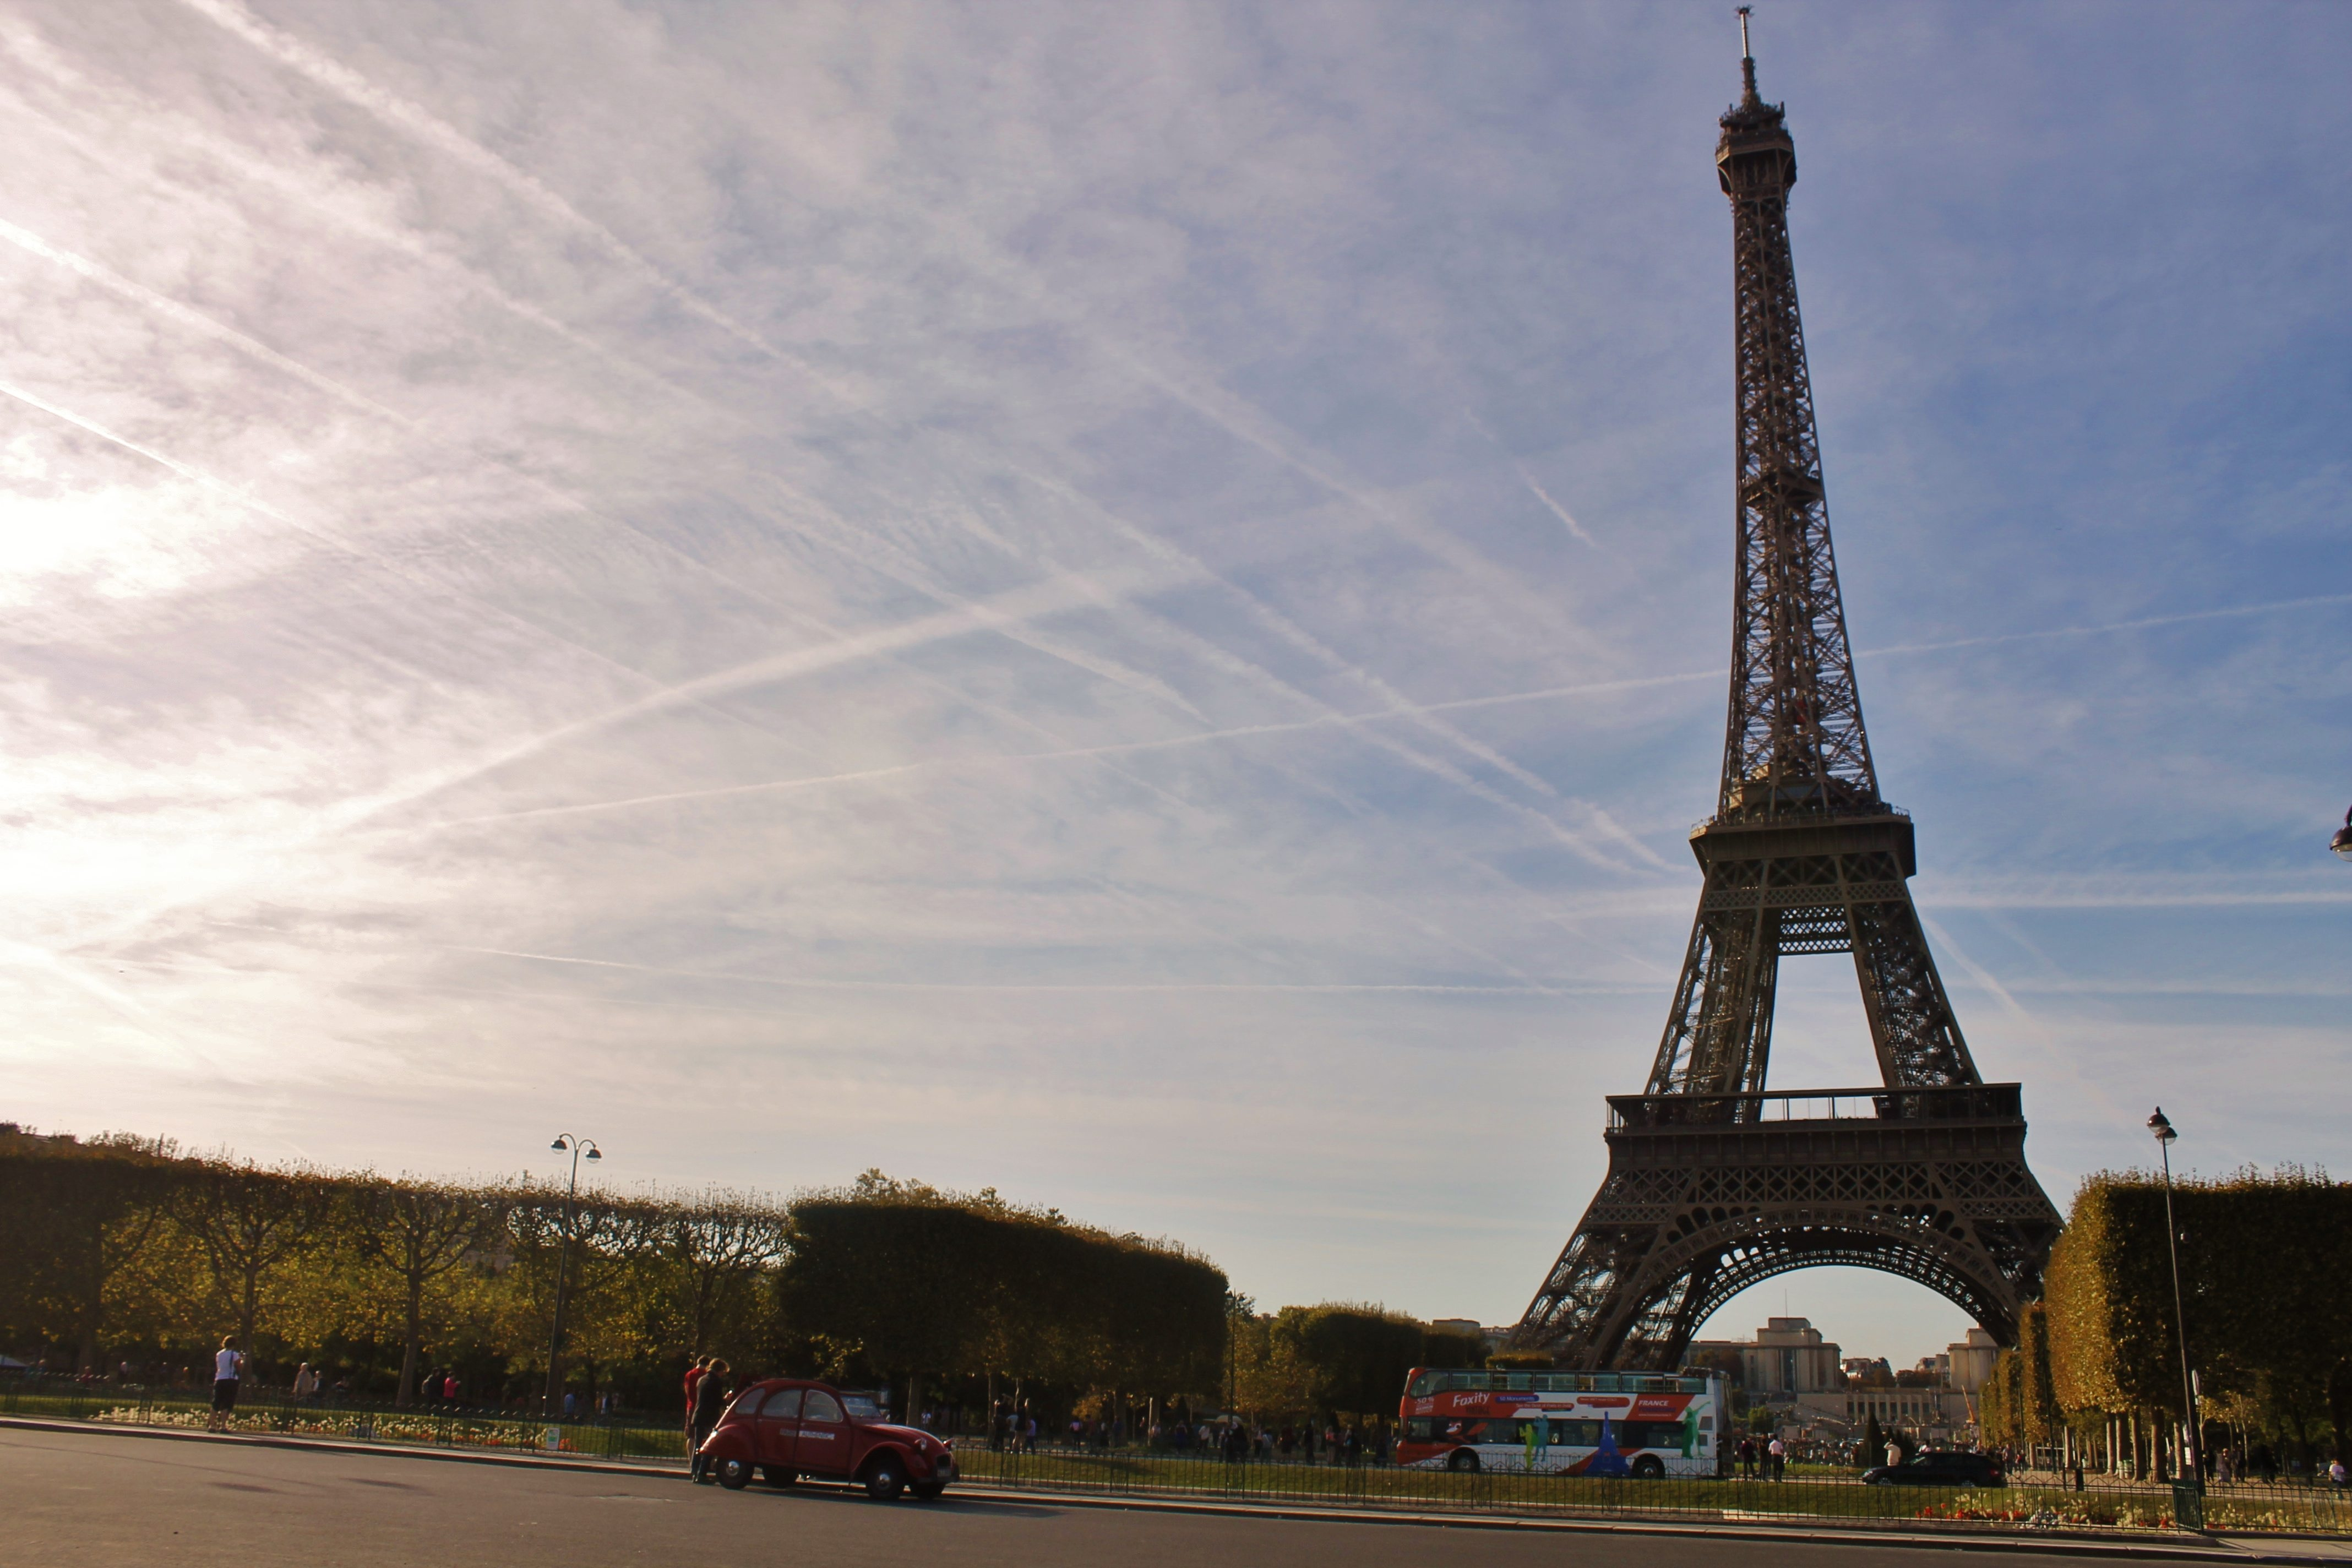 Eiffel Tower in Paris, one of the Most Vegan-Friendly Cities in Europe - AlternativeTravelers.com